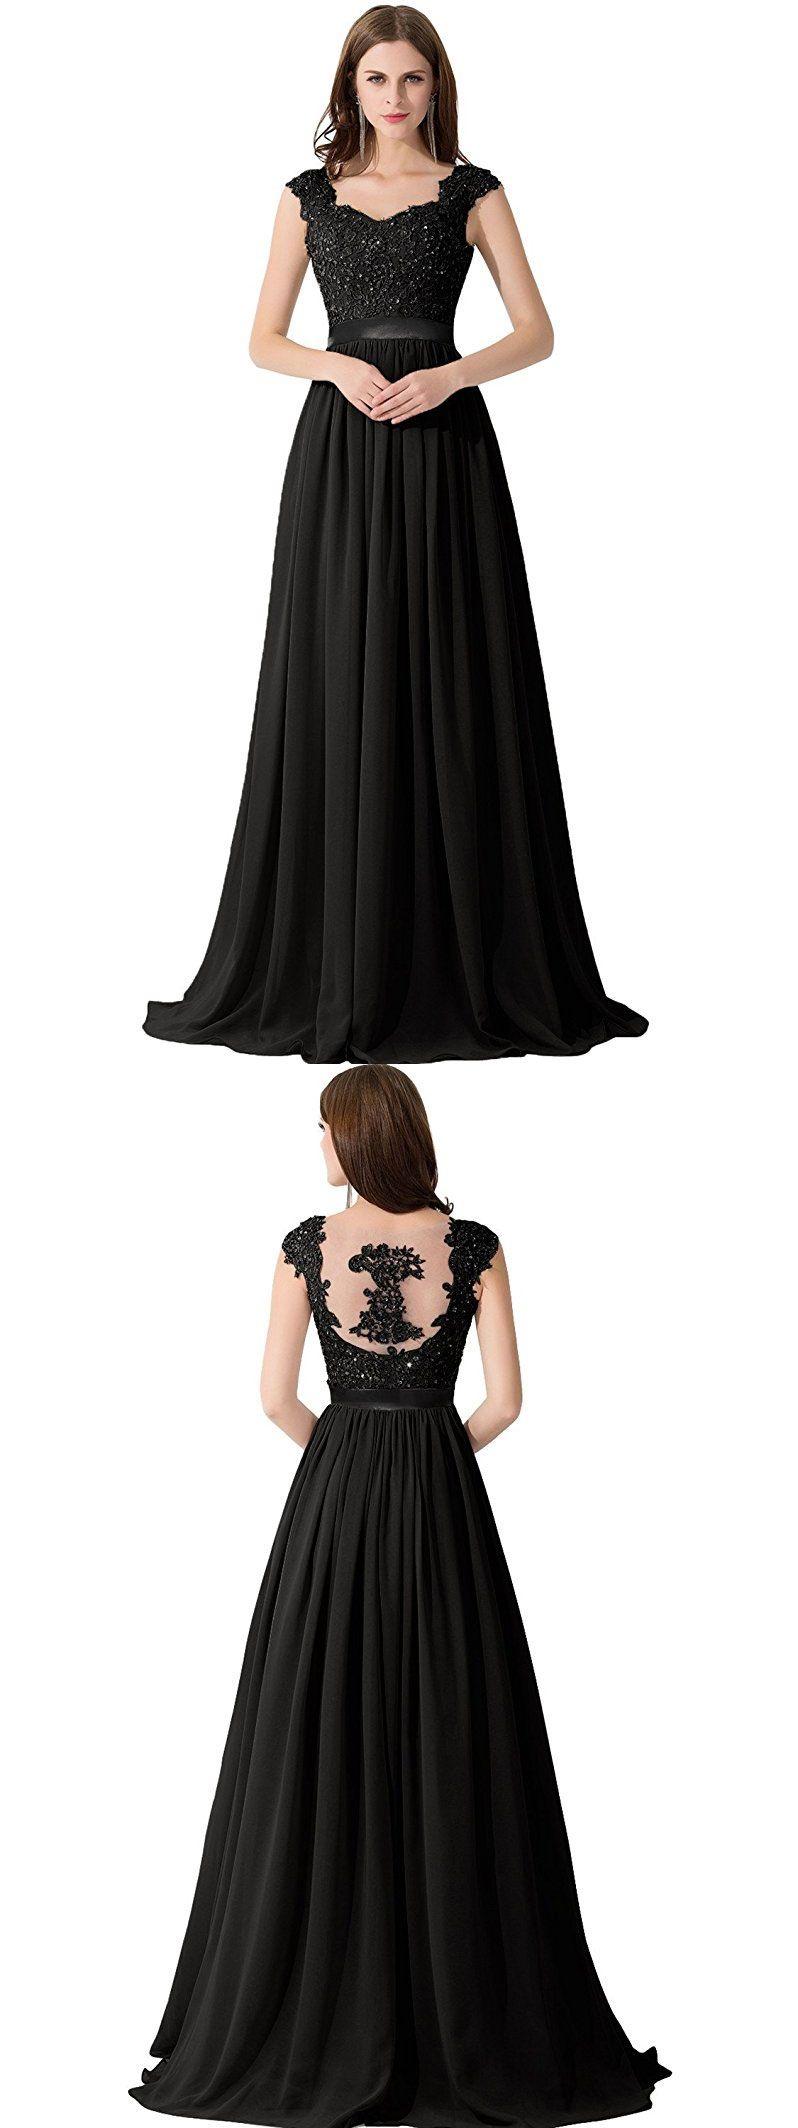 Aline sweetheart sweep train chiffon appliqued beaded black prom